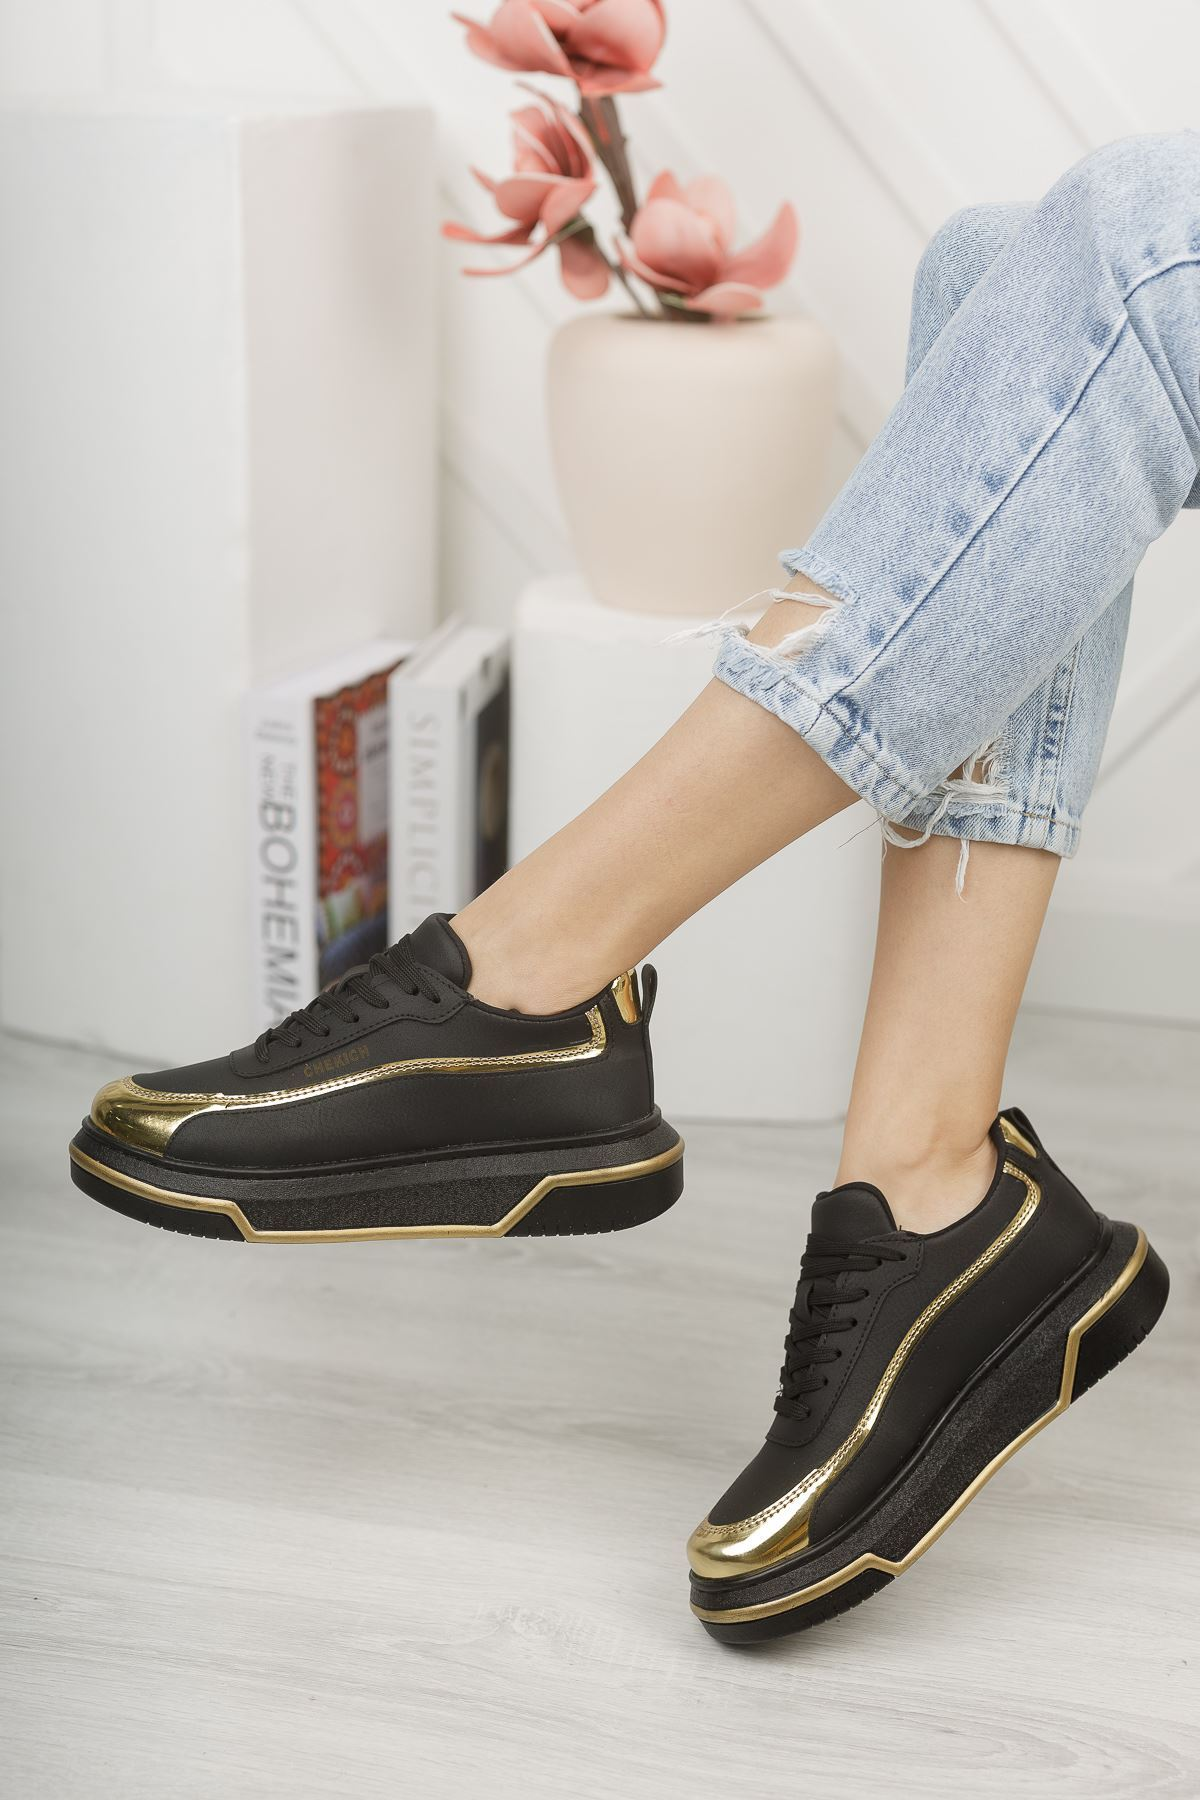 Chekich CH041 ST Kadın Ayakkabı SİYAH/ALTIN